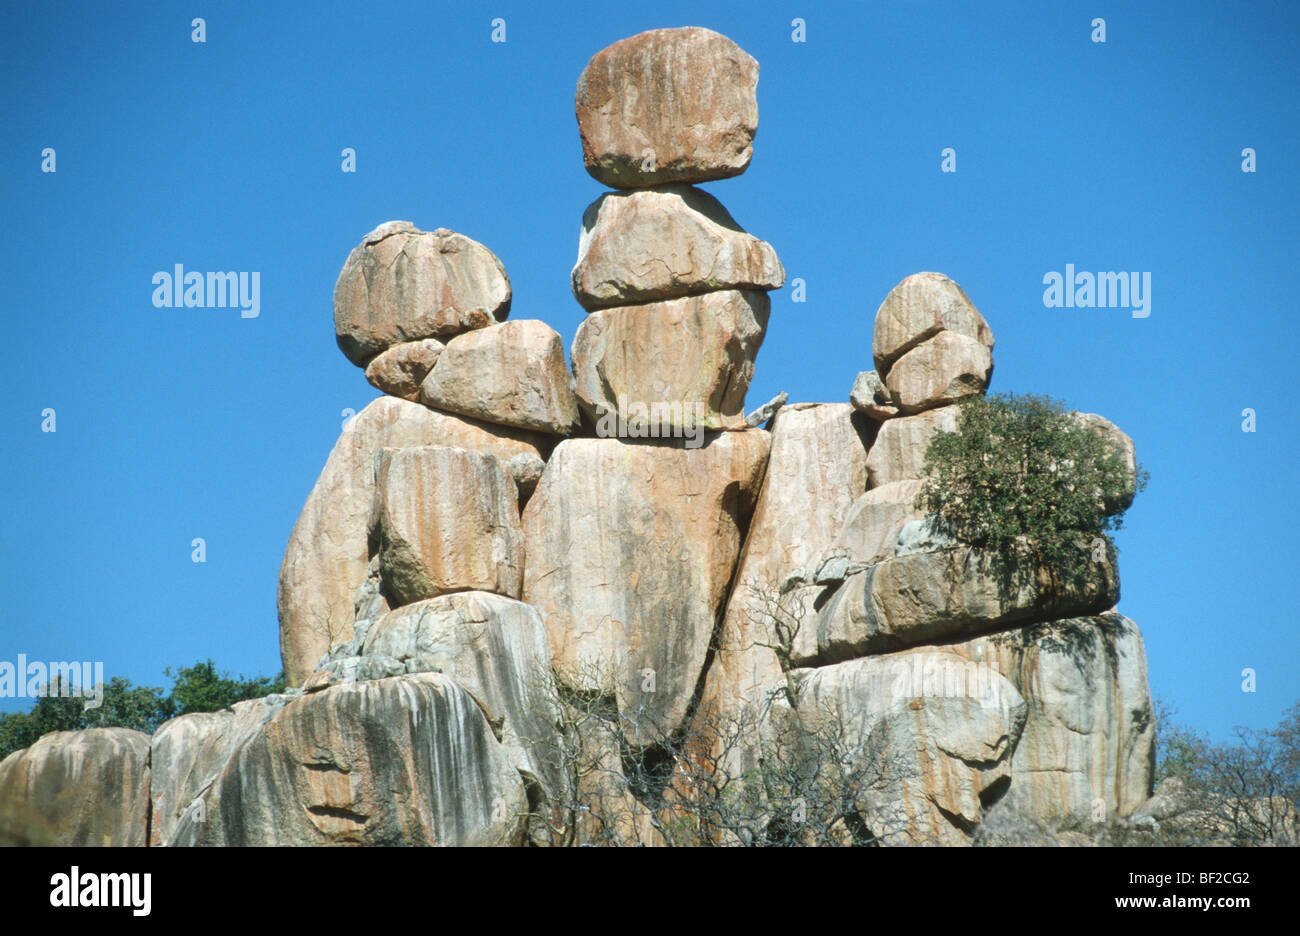 Balancing rocks, Matopos, Zimbabwe - Stock Image